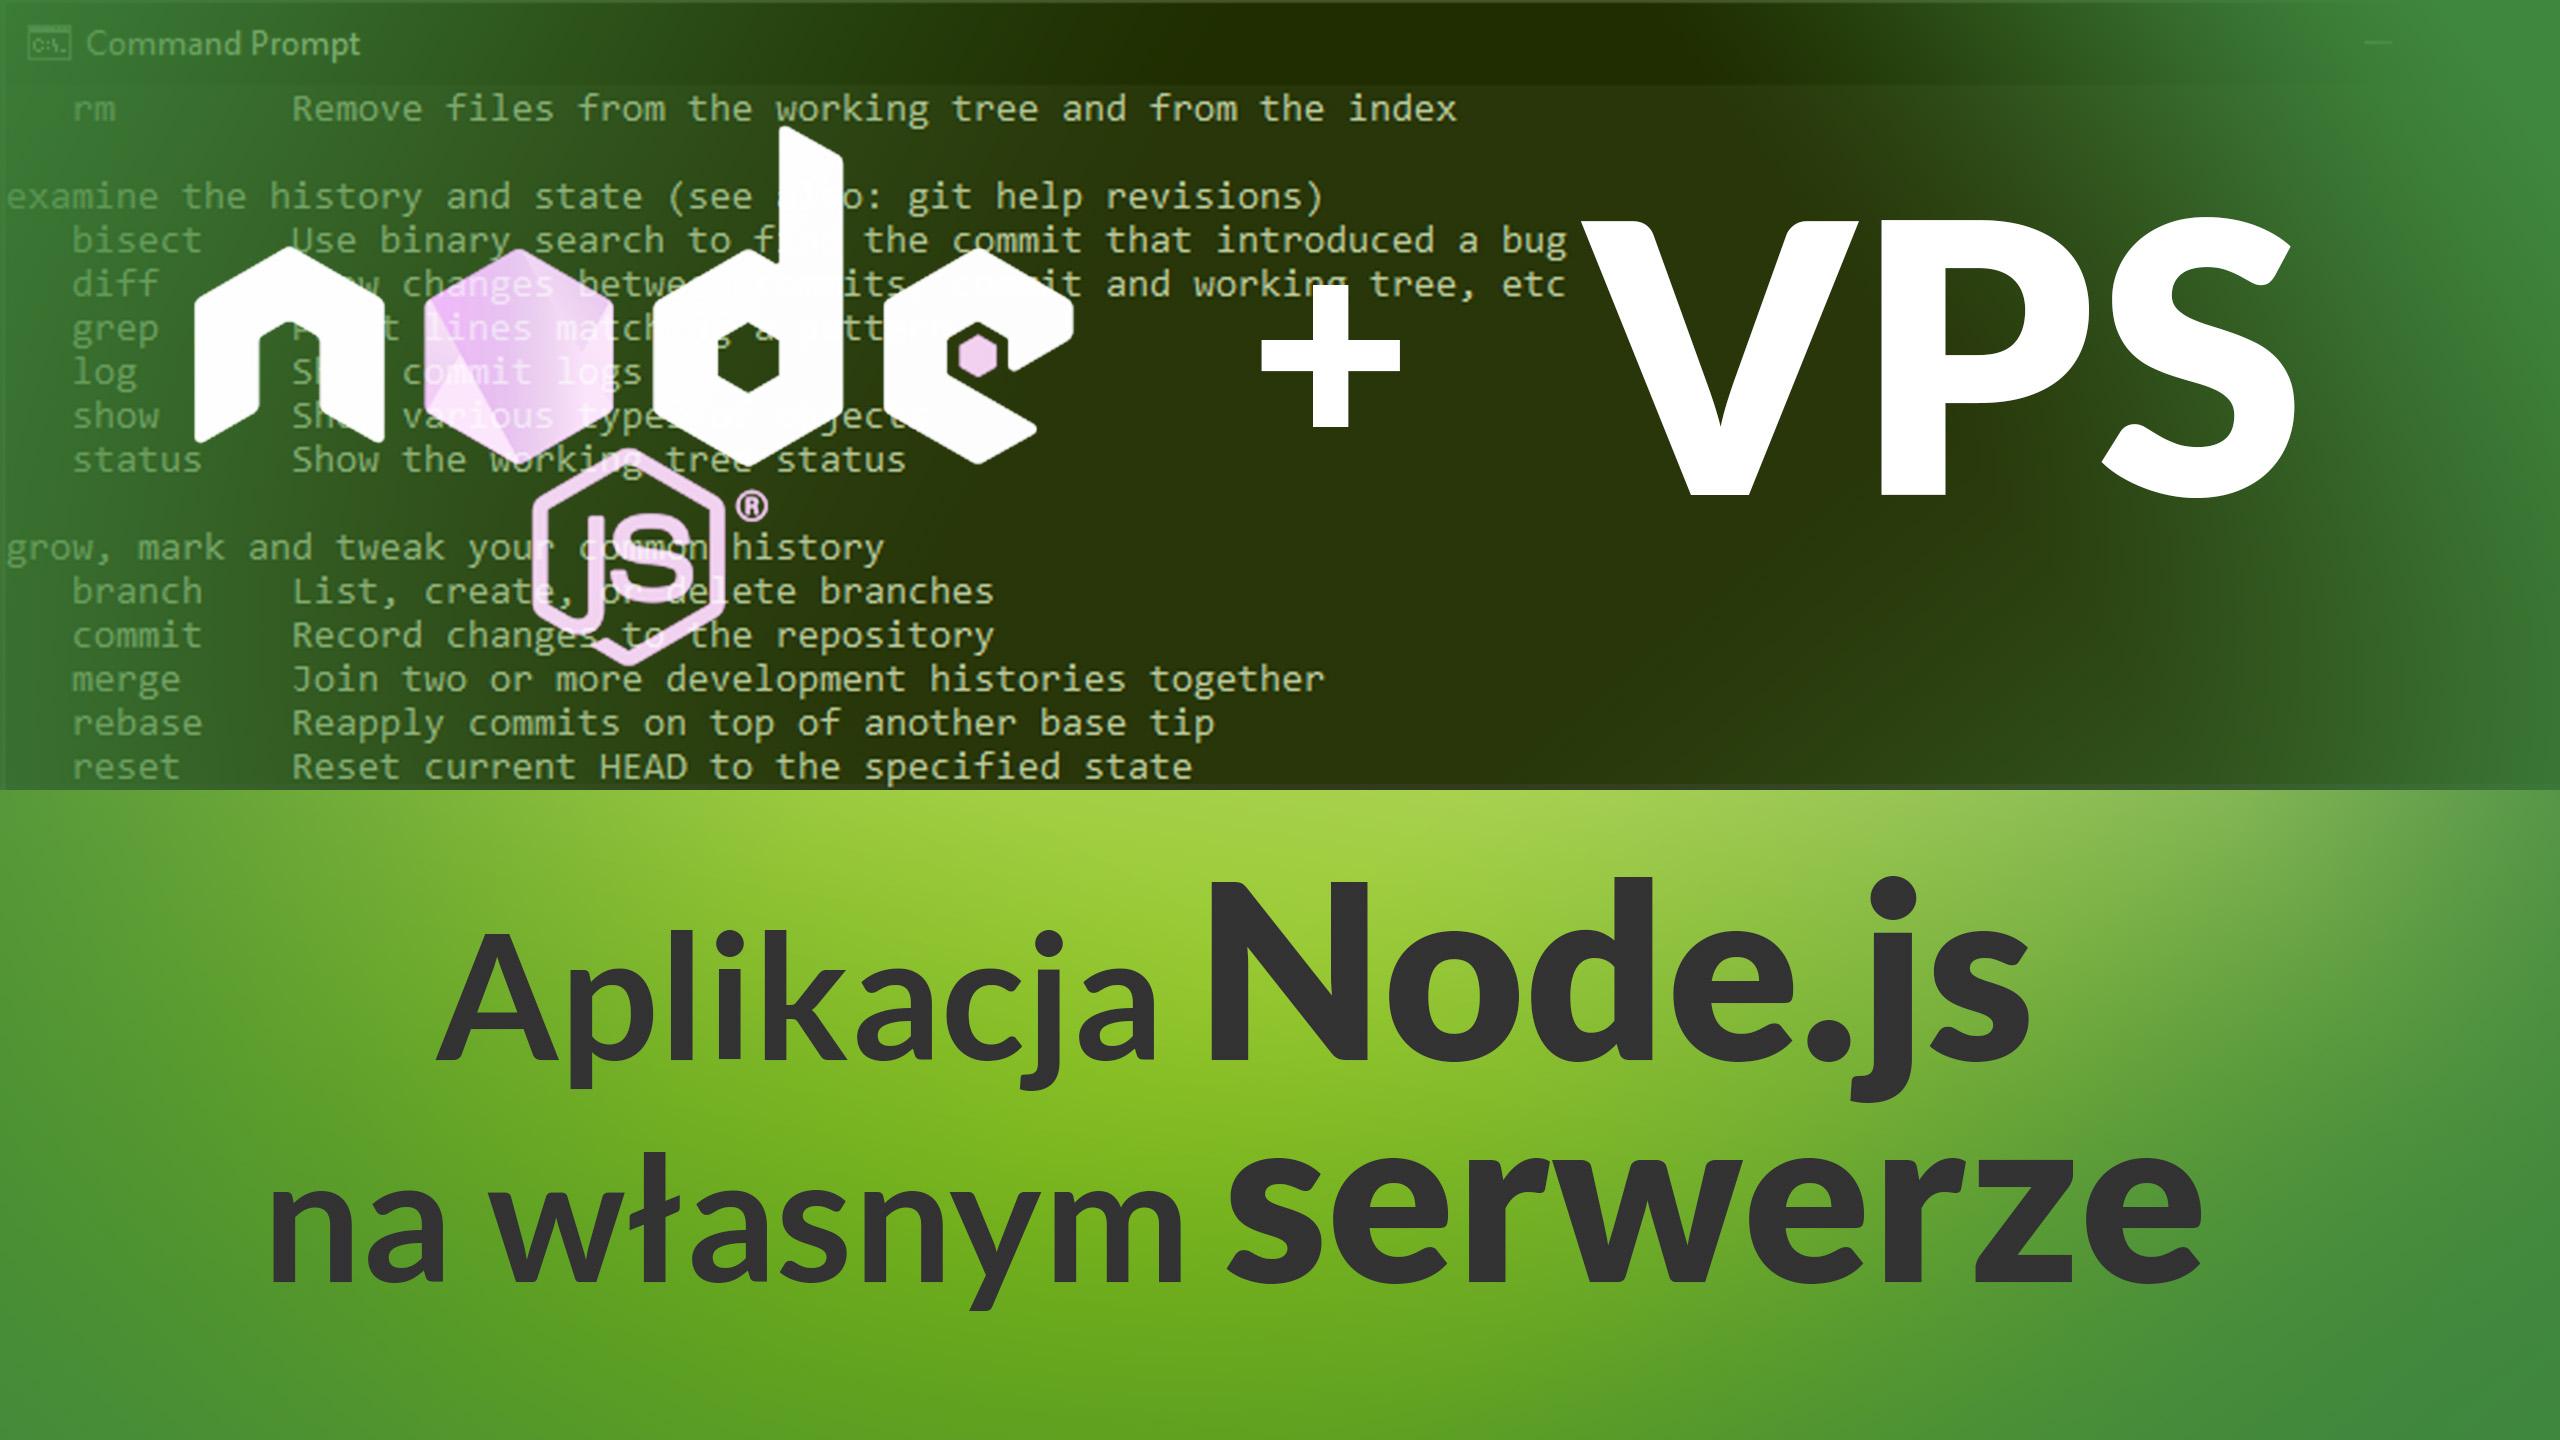 node na serverze - Jak postawić aplikacje Node.js na serwerze